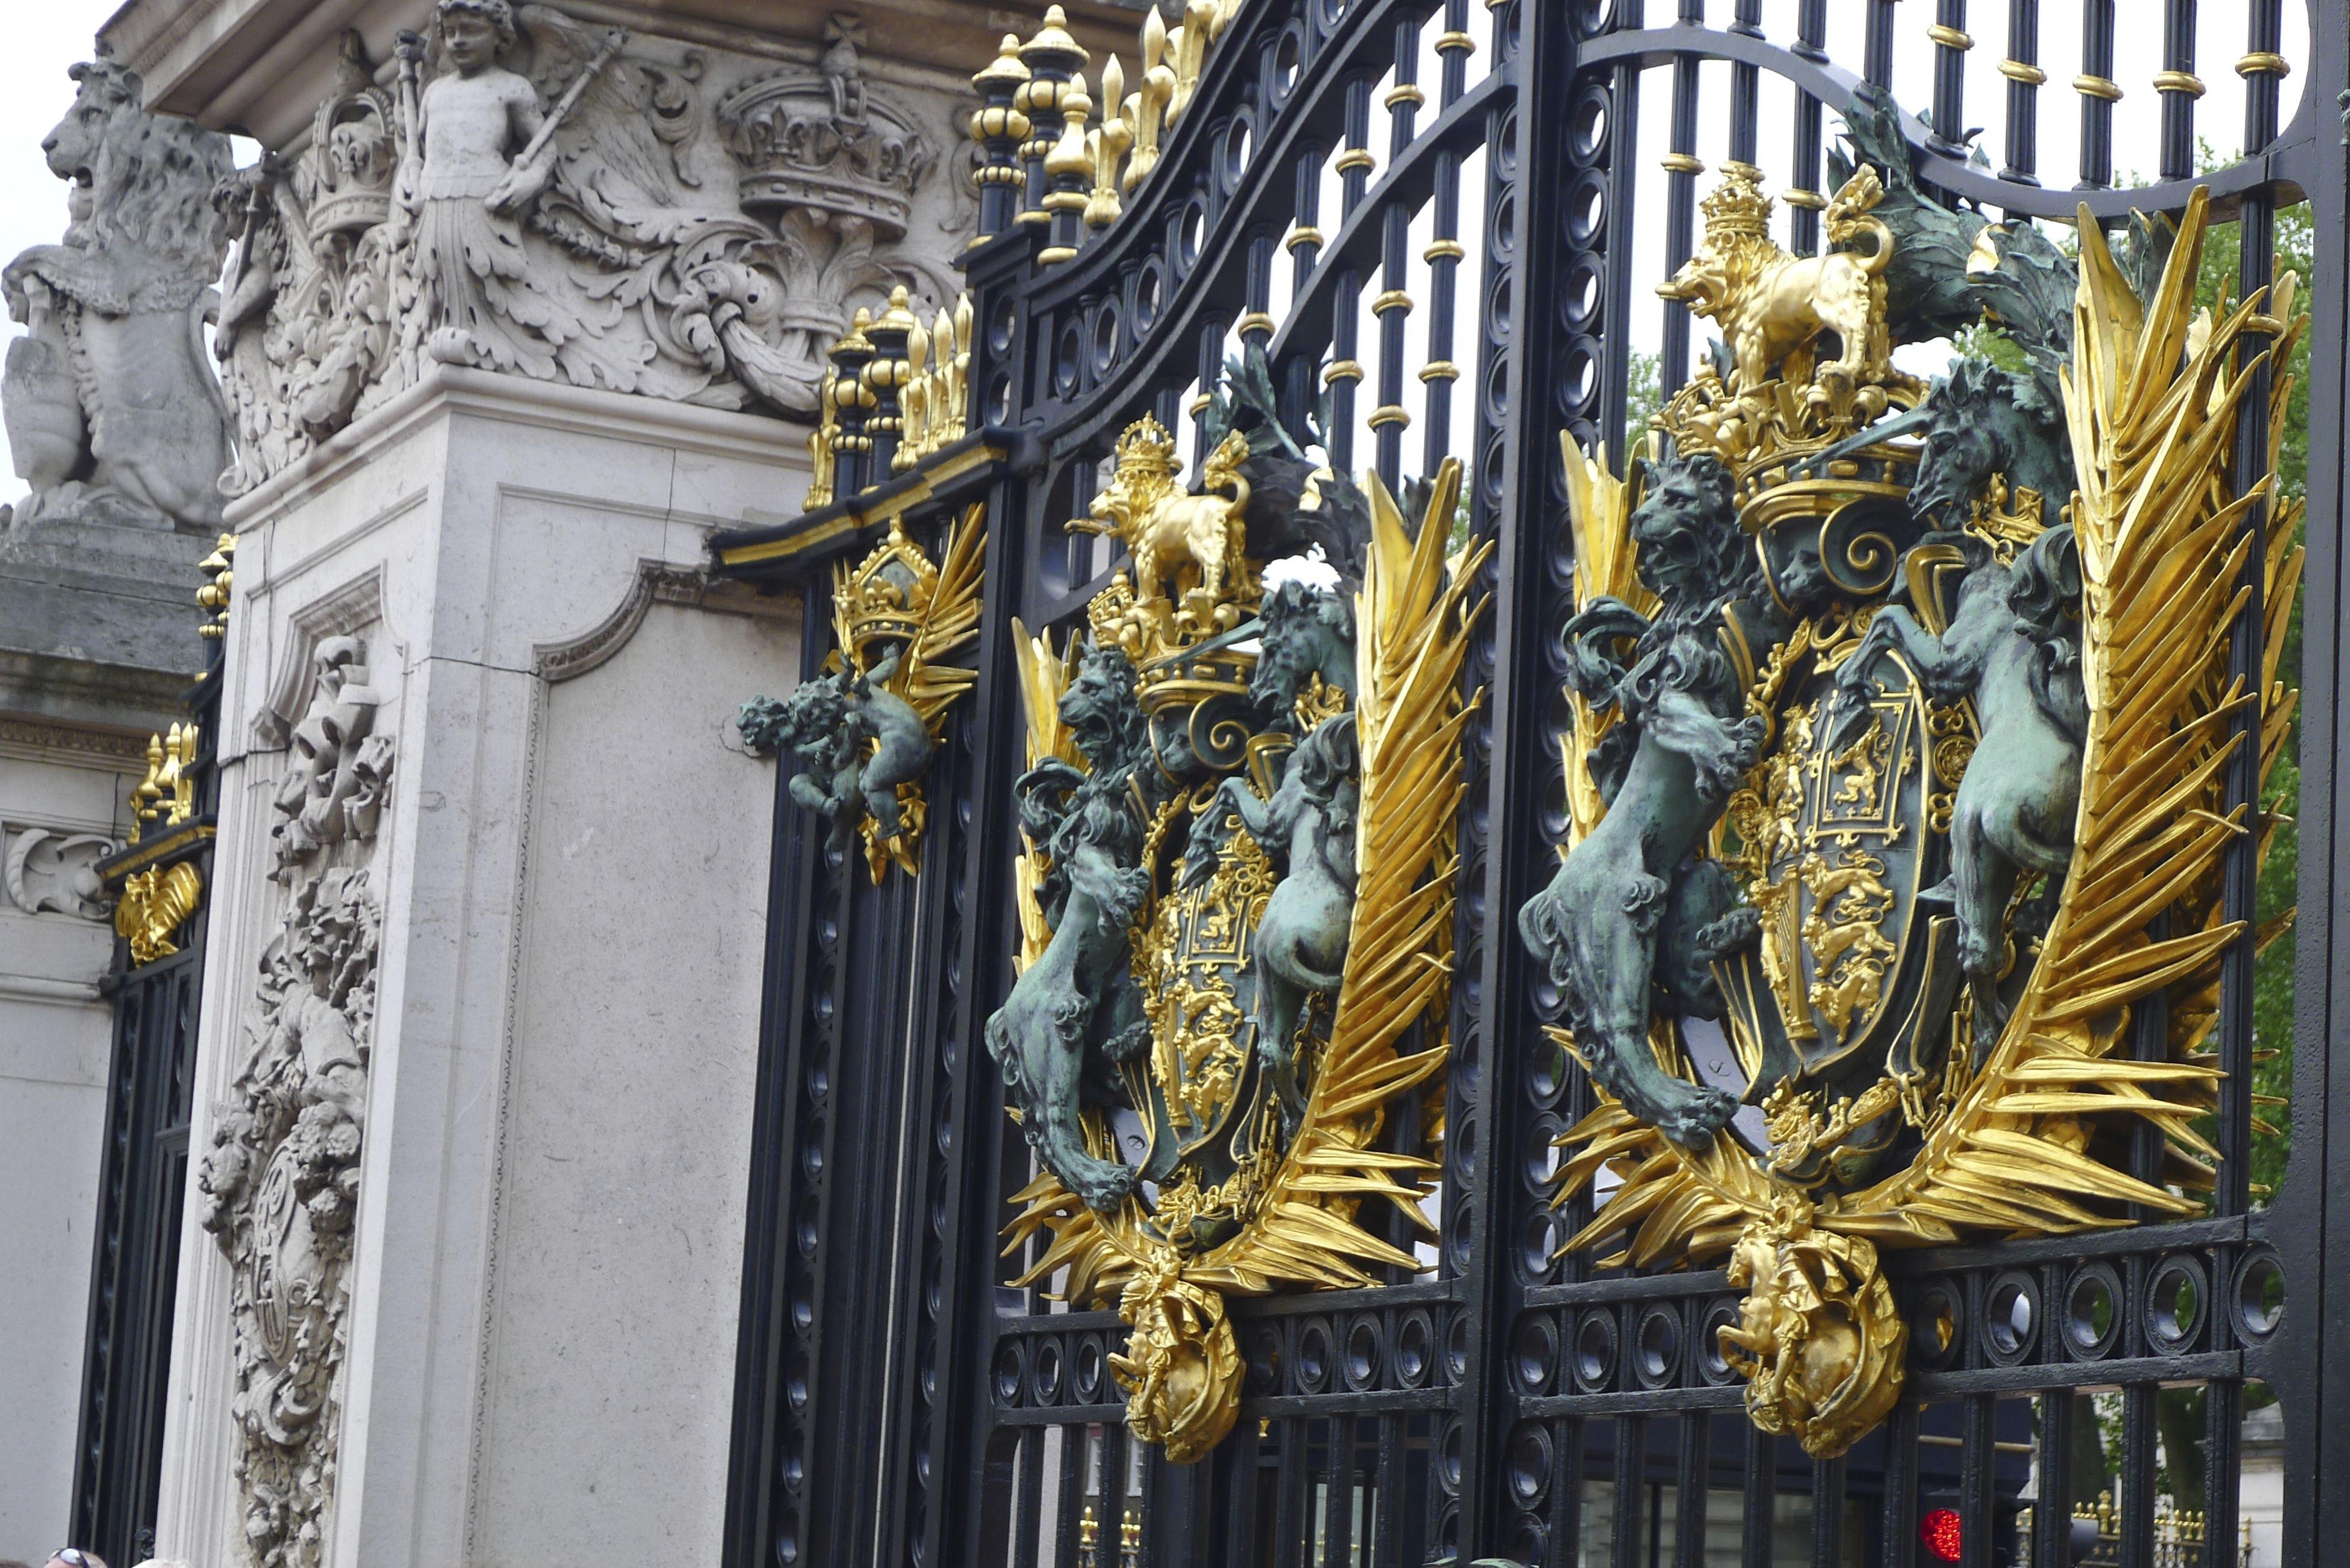 London the Pakenham Palace & London the Pakenham Palace | Grades | Pinterest | Palace and Doors